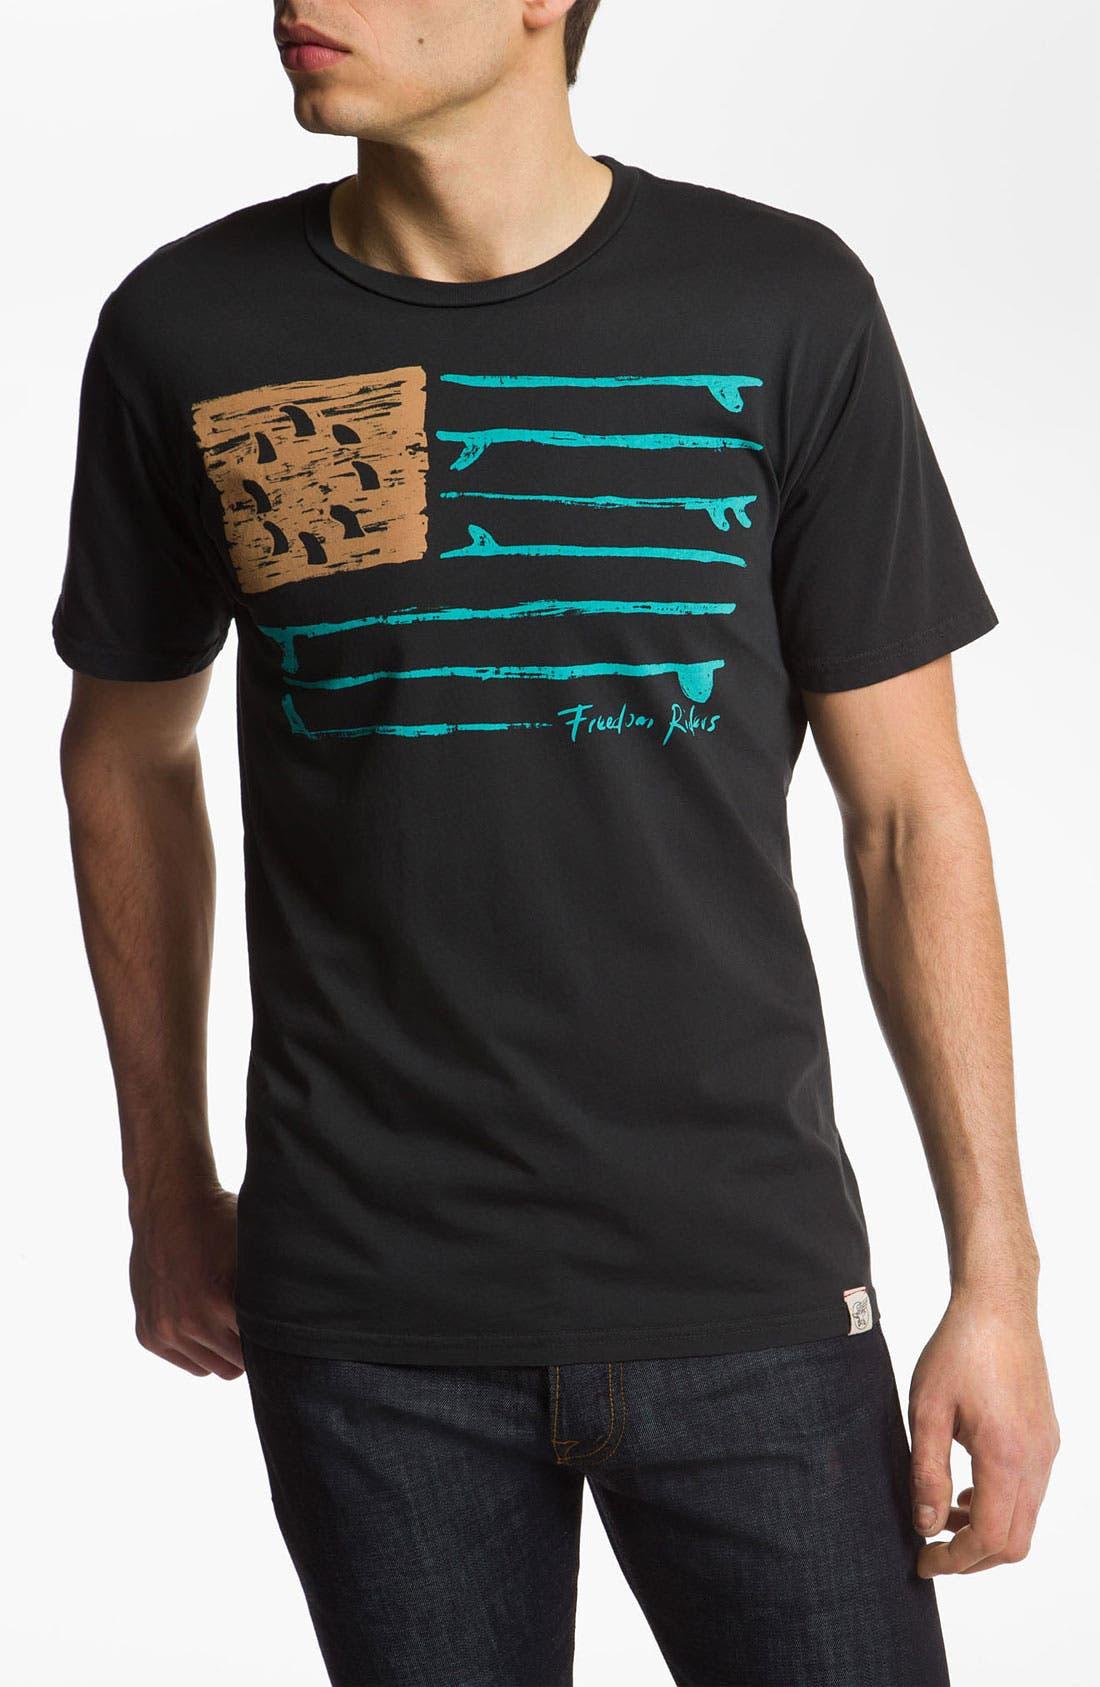 Alternate Image 1 Selected - Iron & Resin 'Freedom Flag' Screenprint T-Shirt